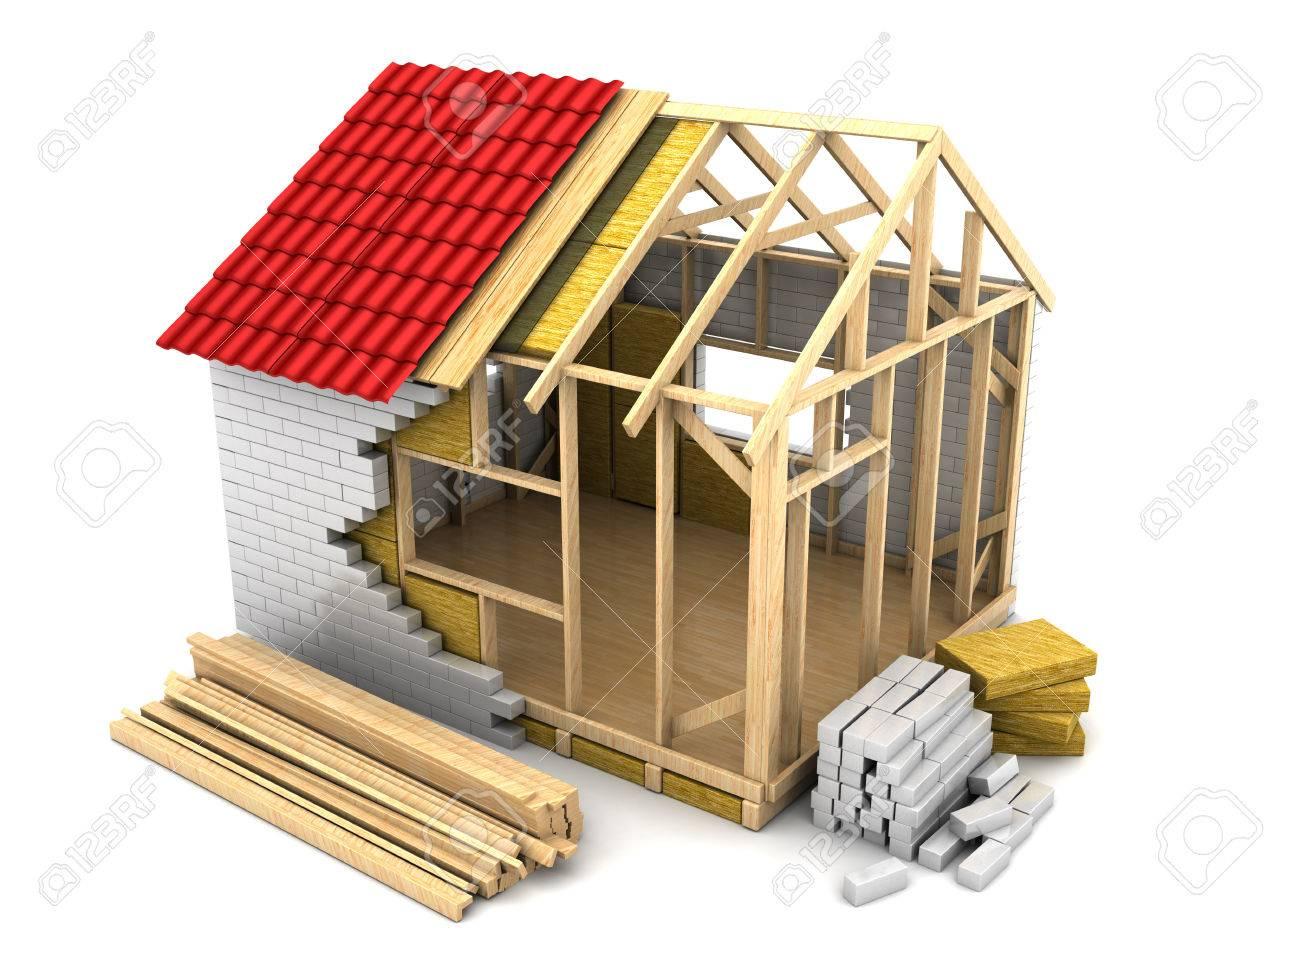 3d illustration of modern frame house construction - 40375864